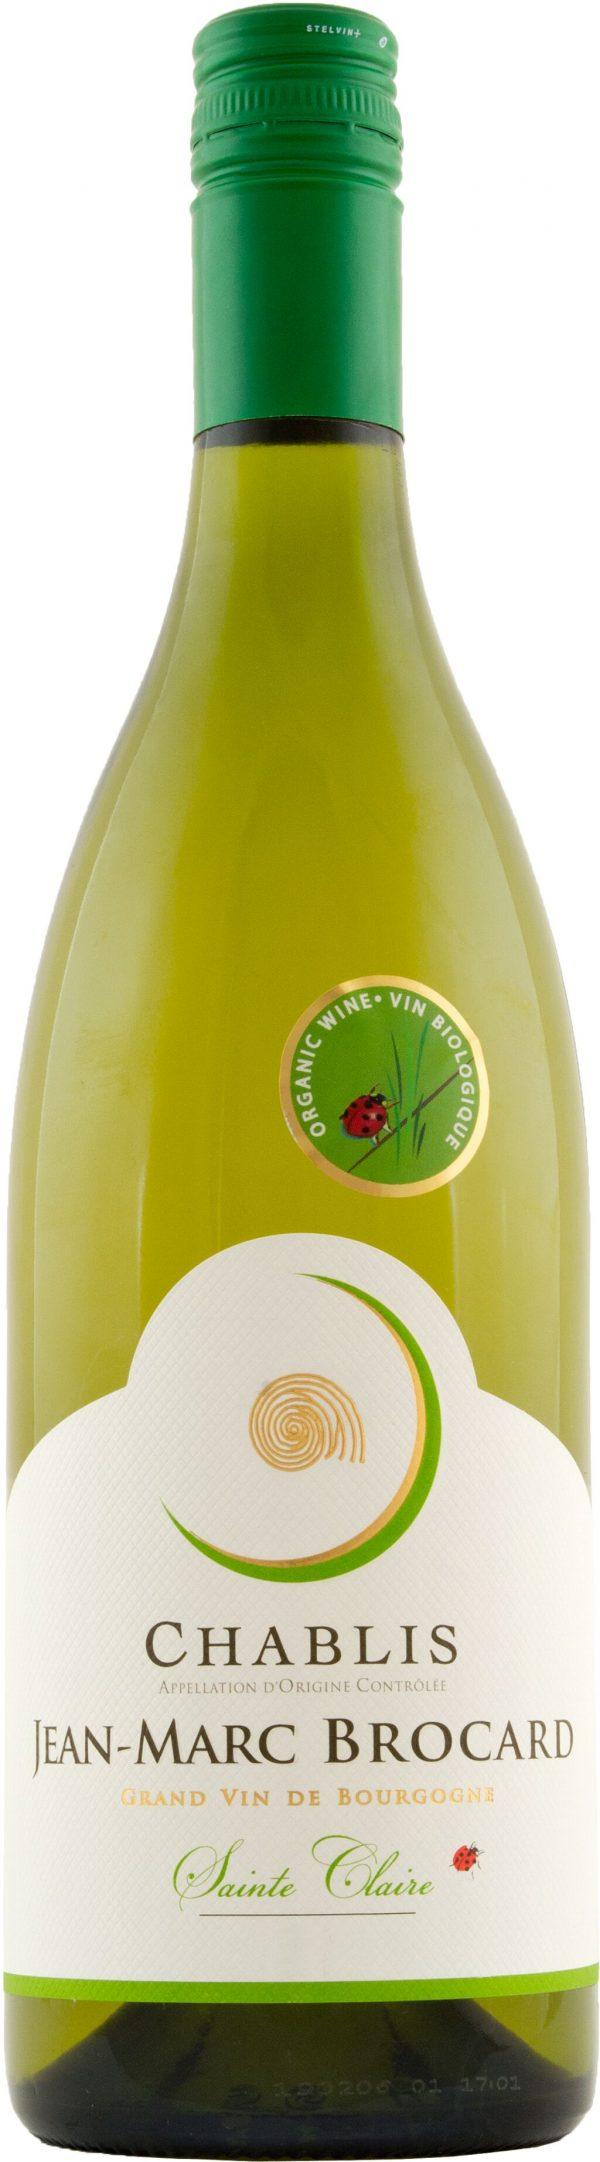 Brocard Chablis Sainte Claire Organic 75cl